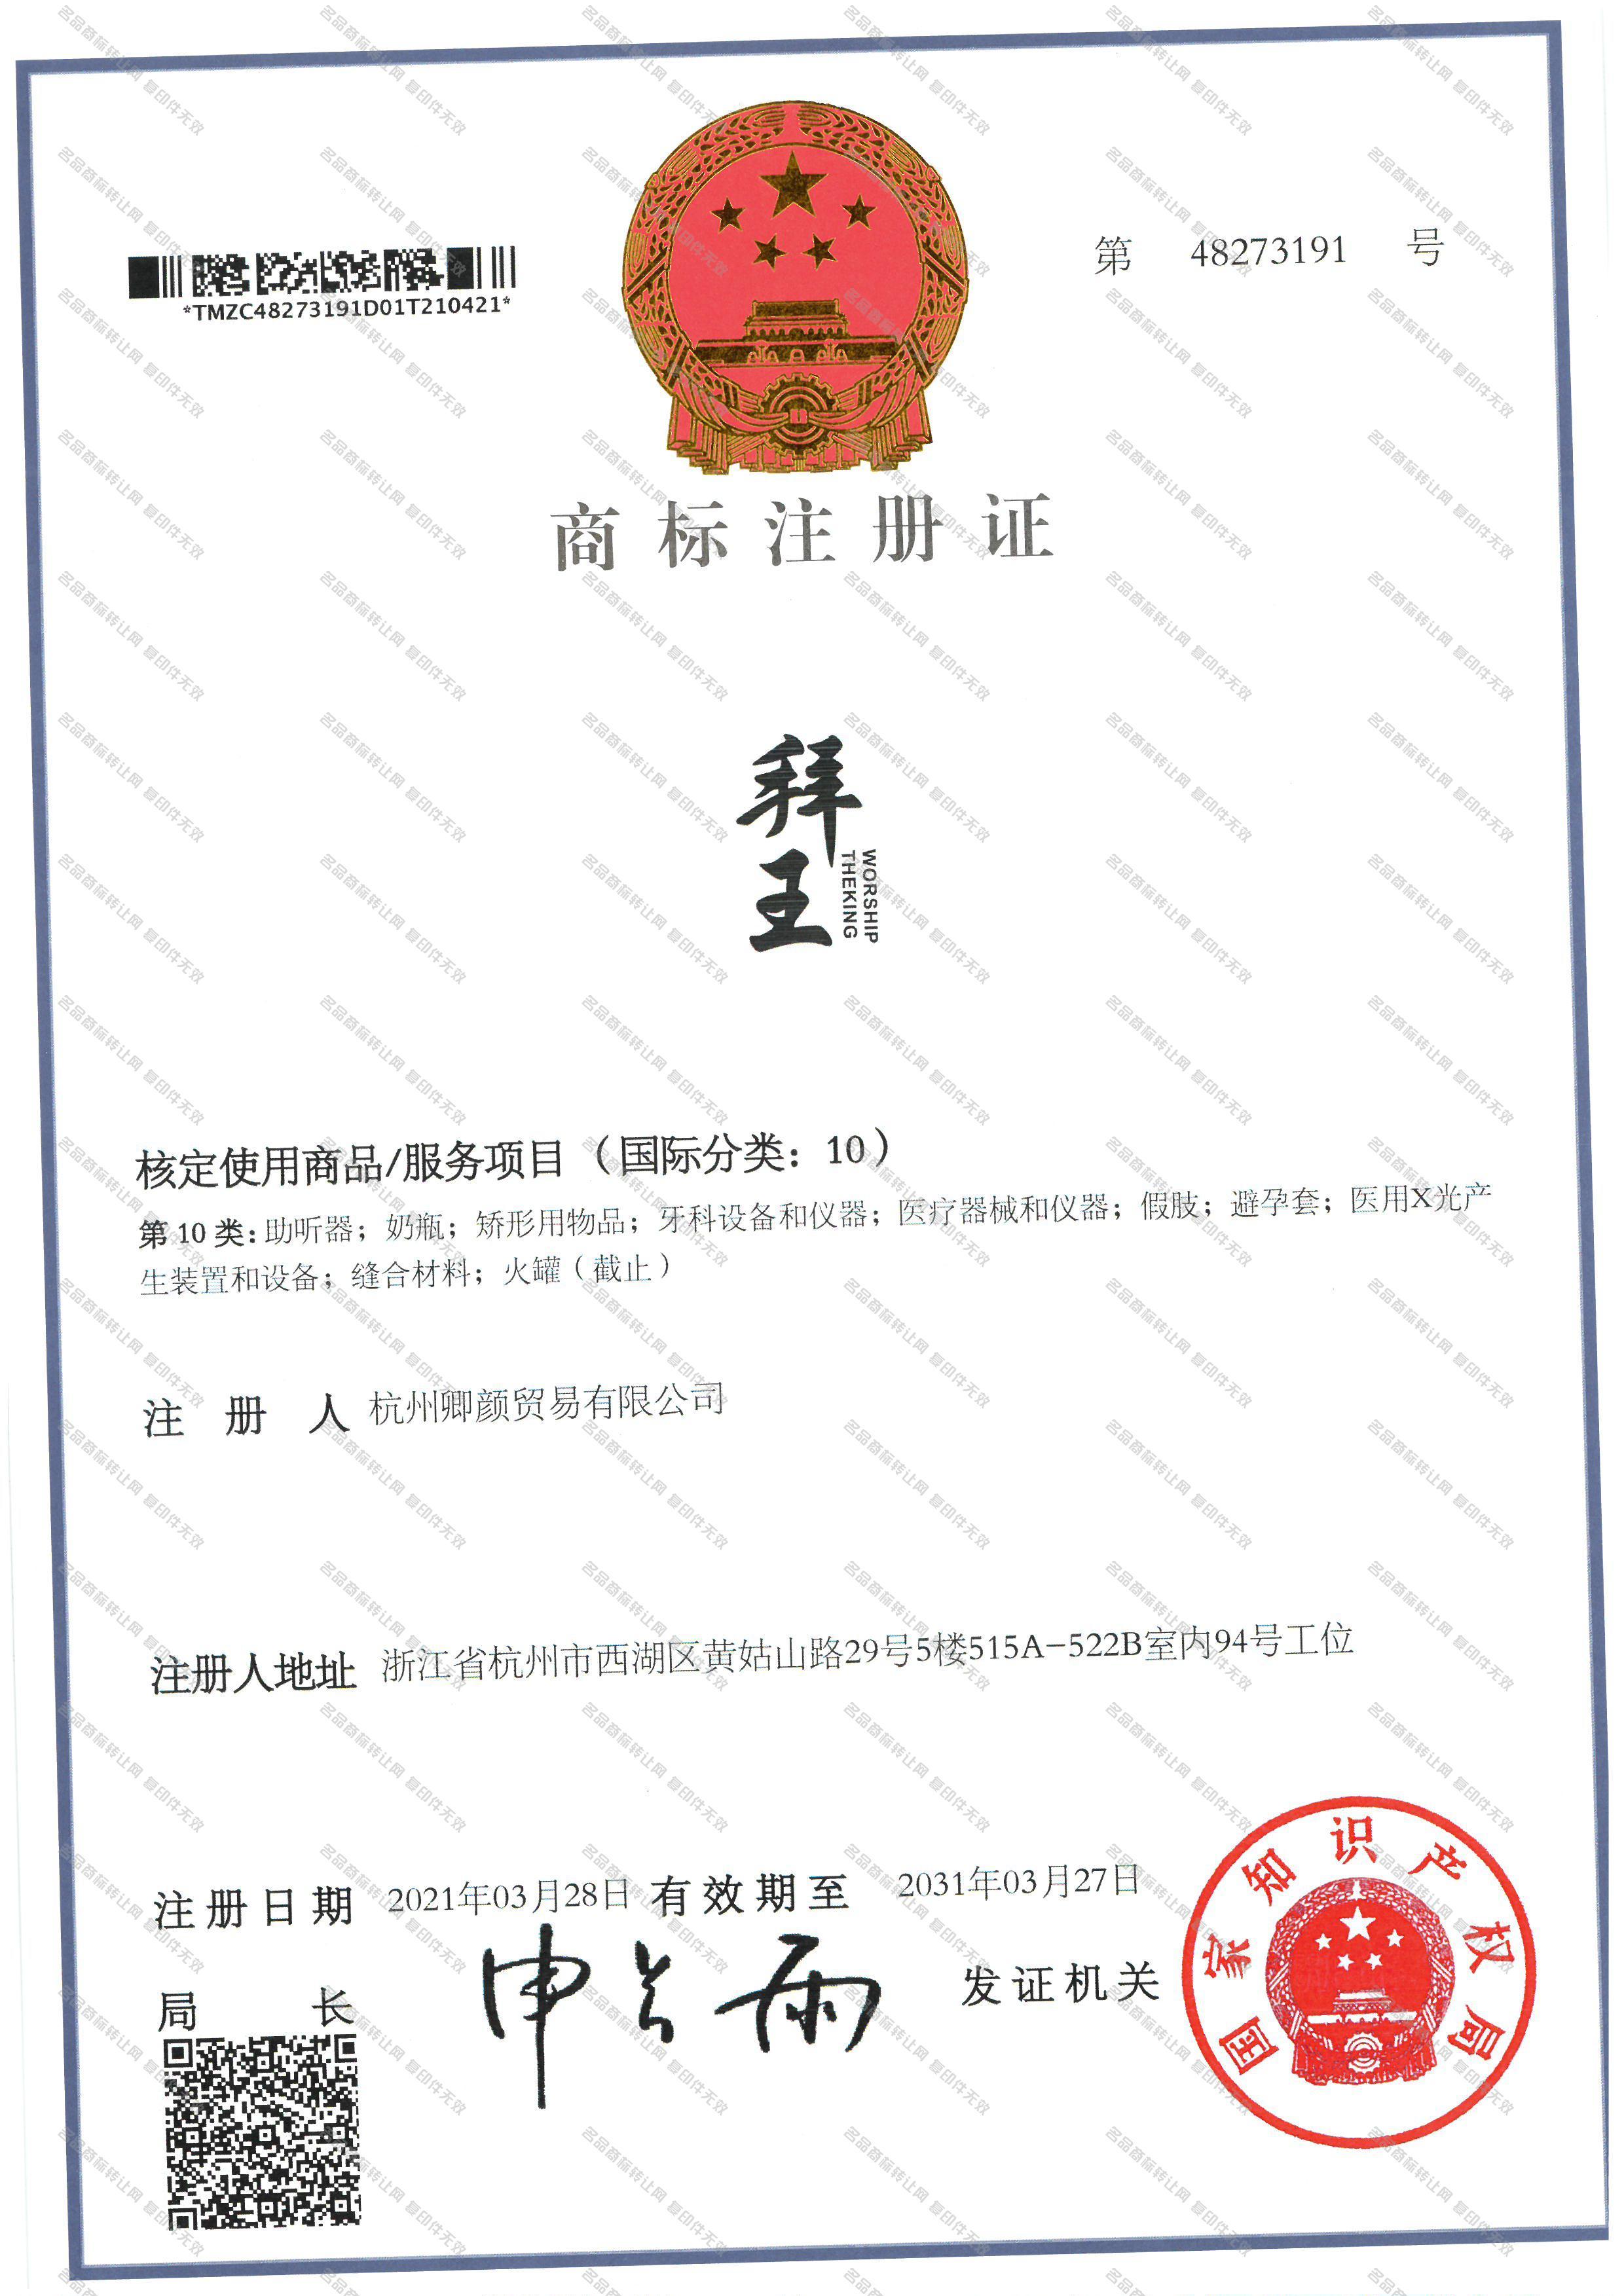 拜王 WORSHIP THEKING注册证